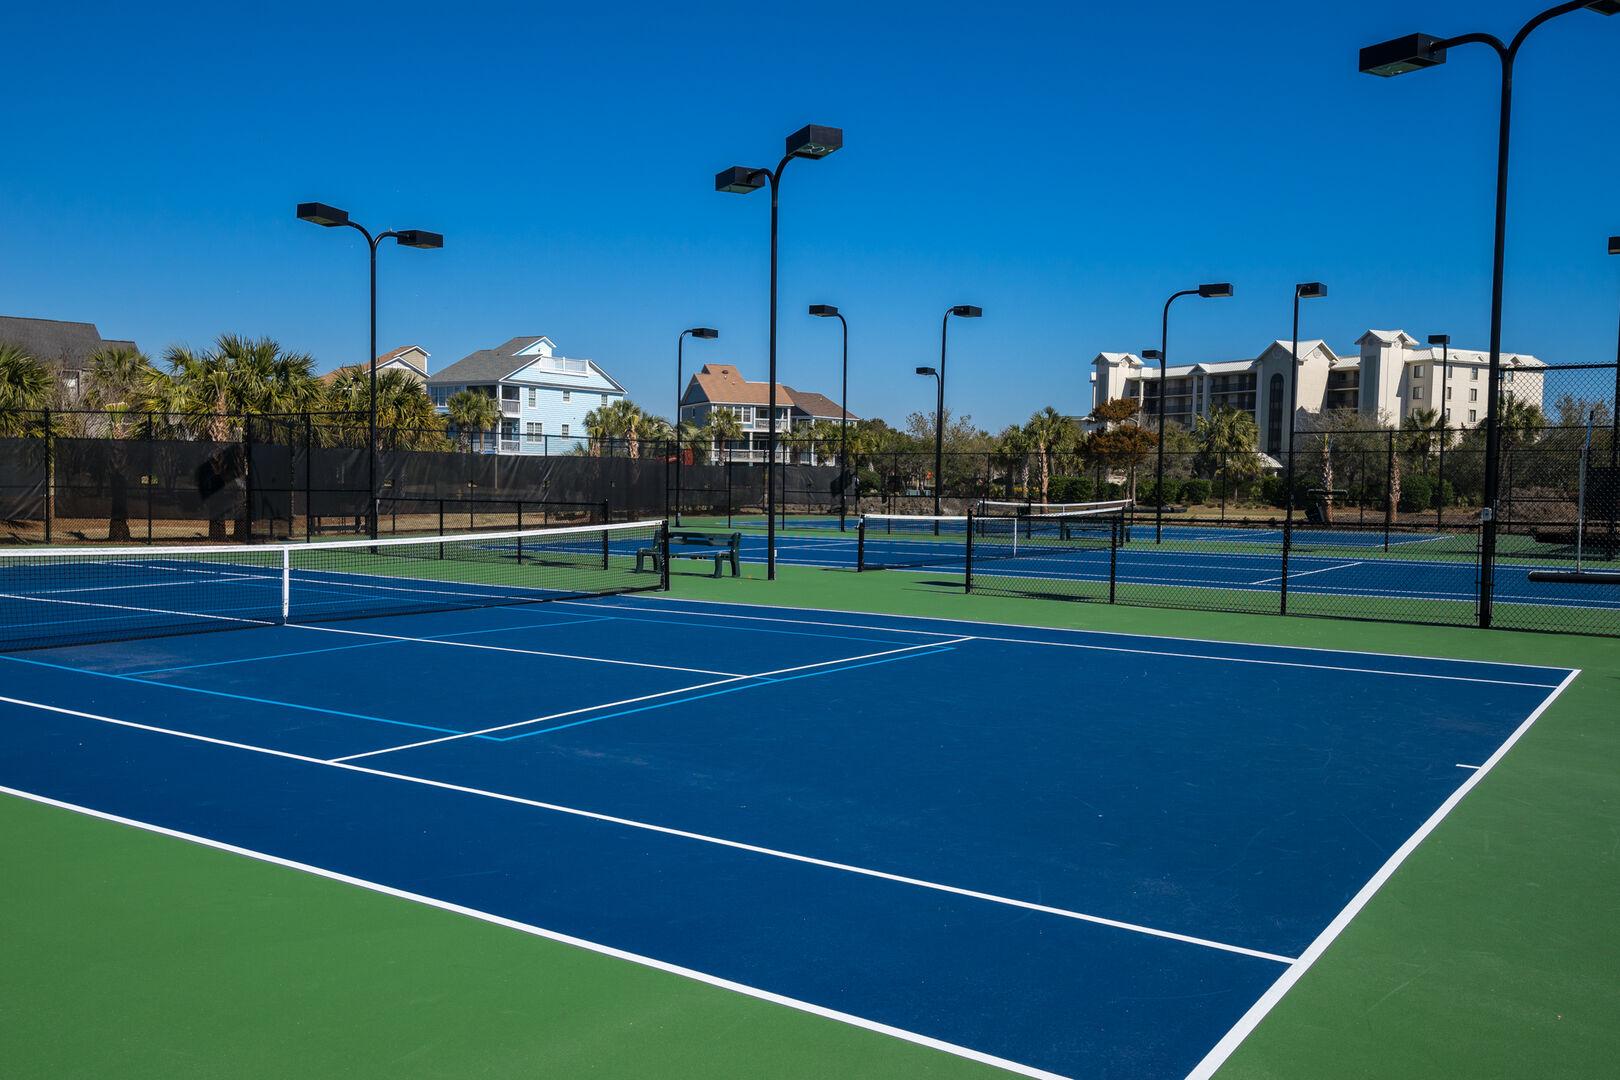 Community Tennis Courts